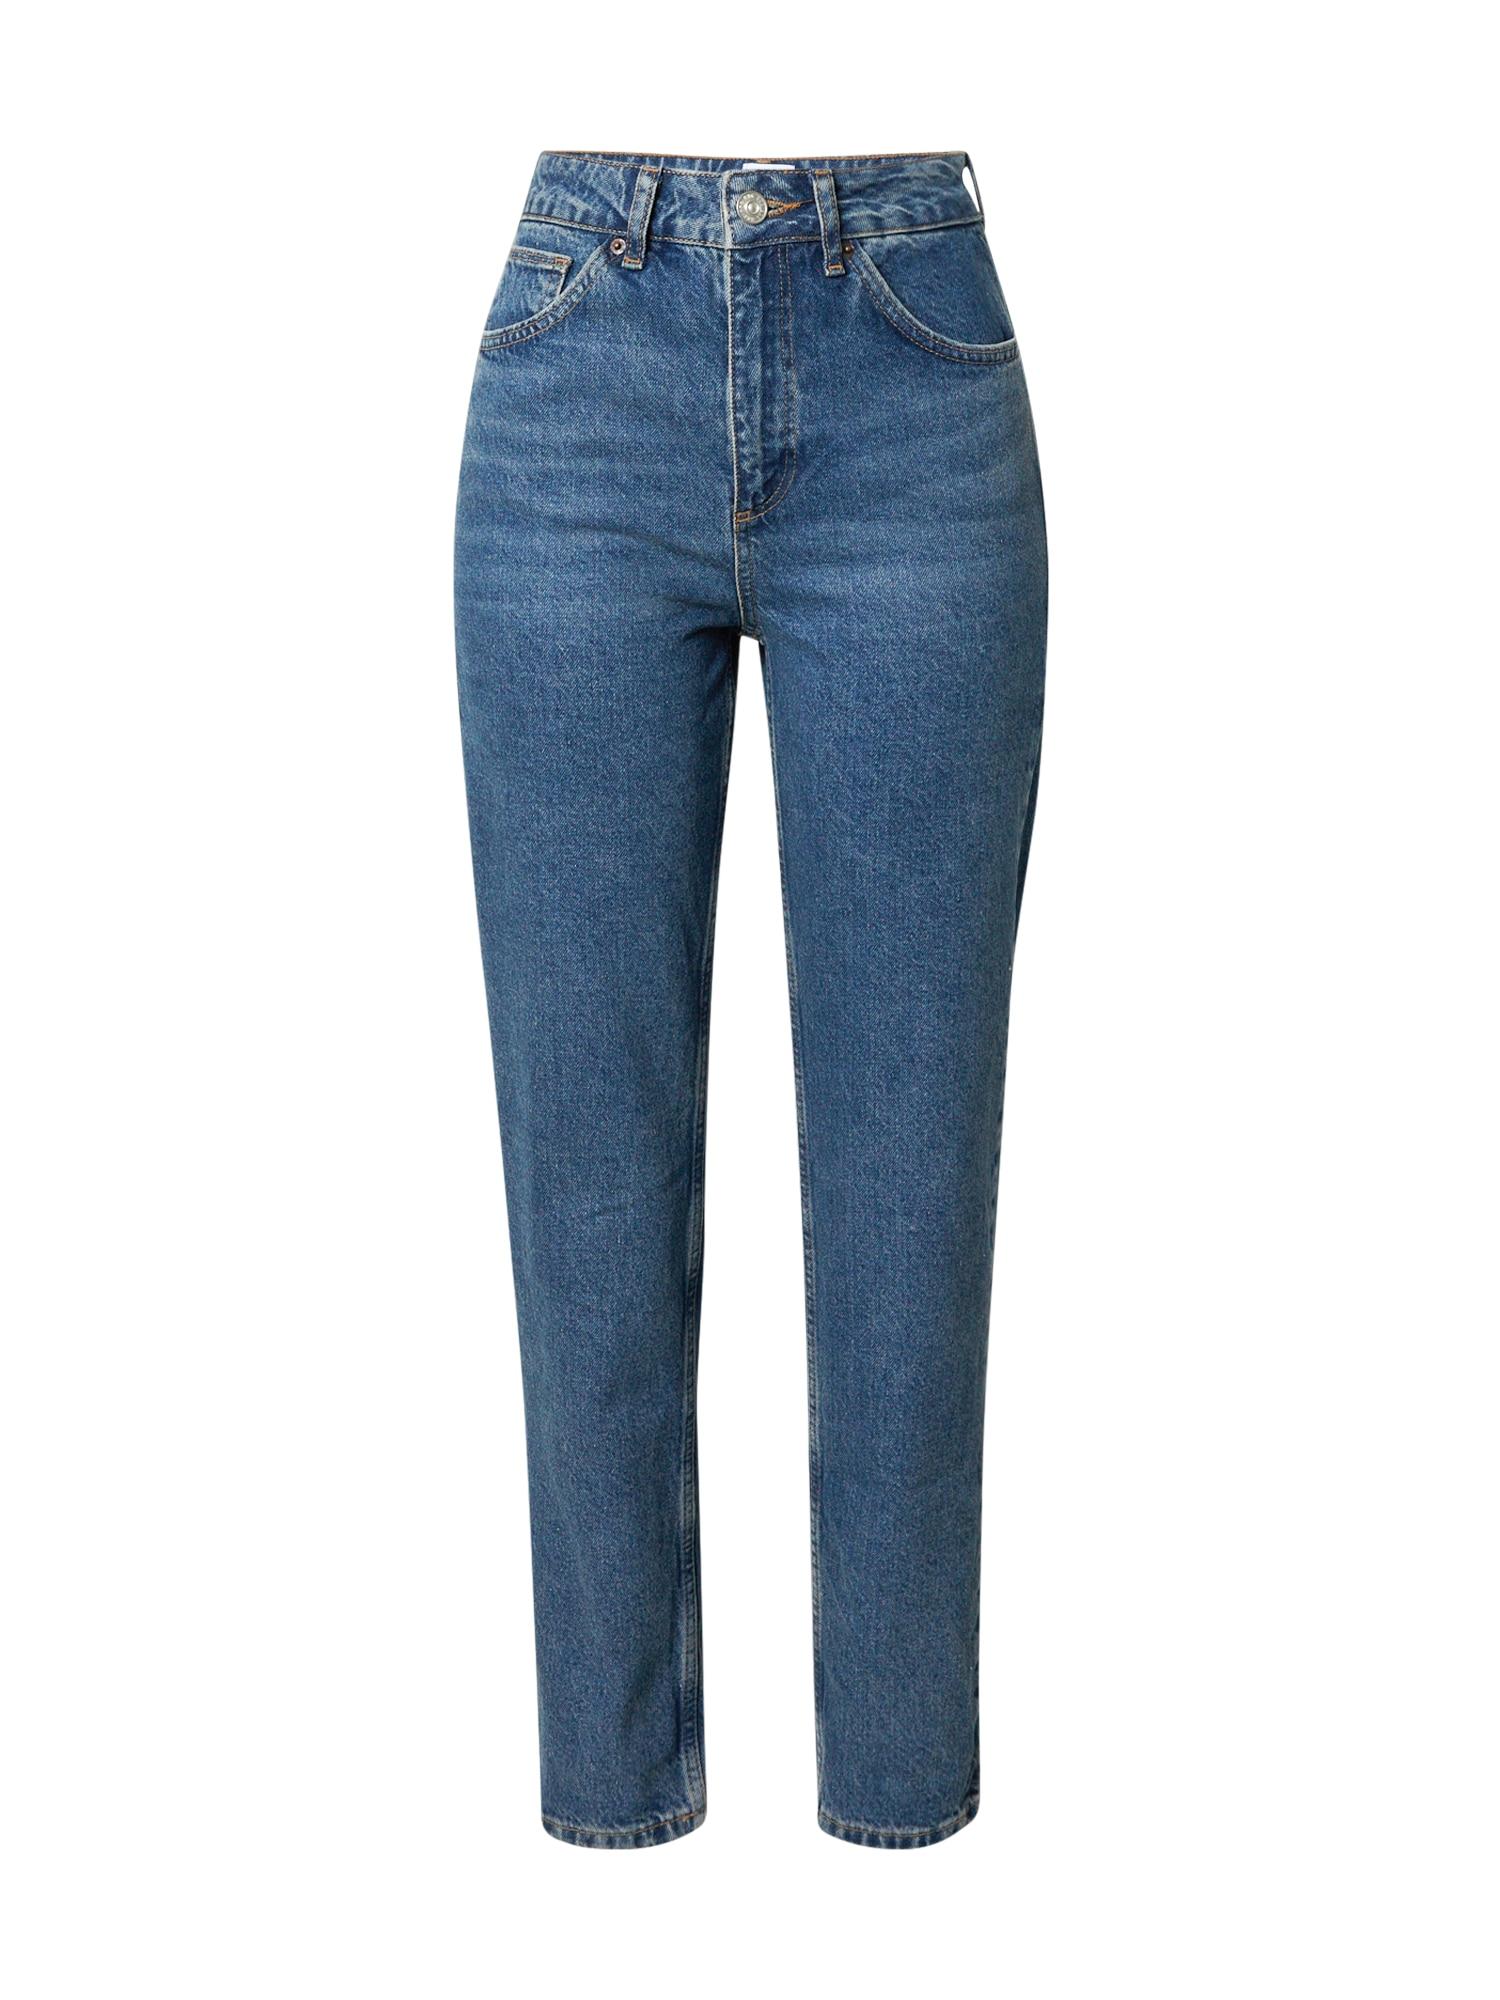 BDG Urban Outfitters Džinsai tamsiai (džinso) mėlyna